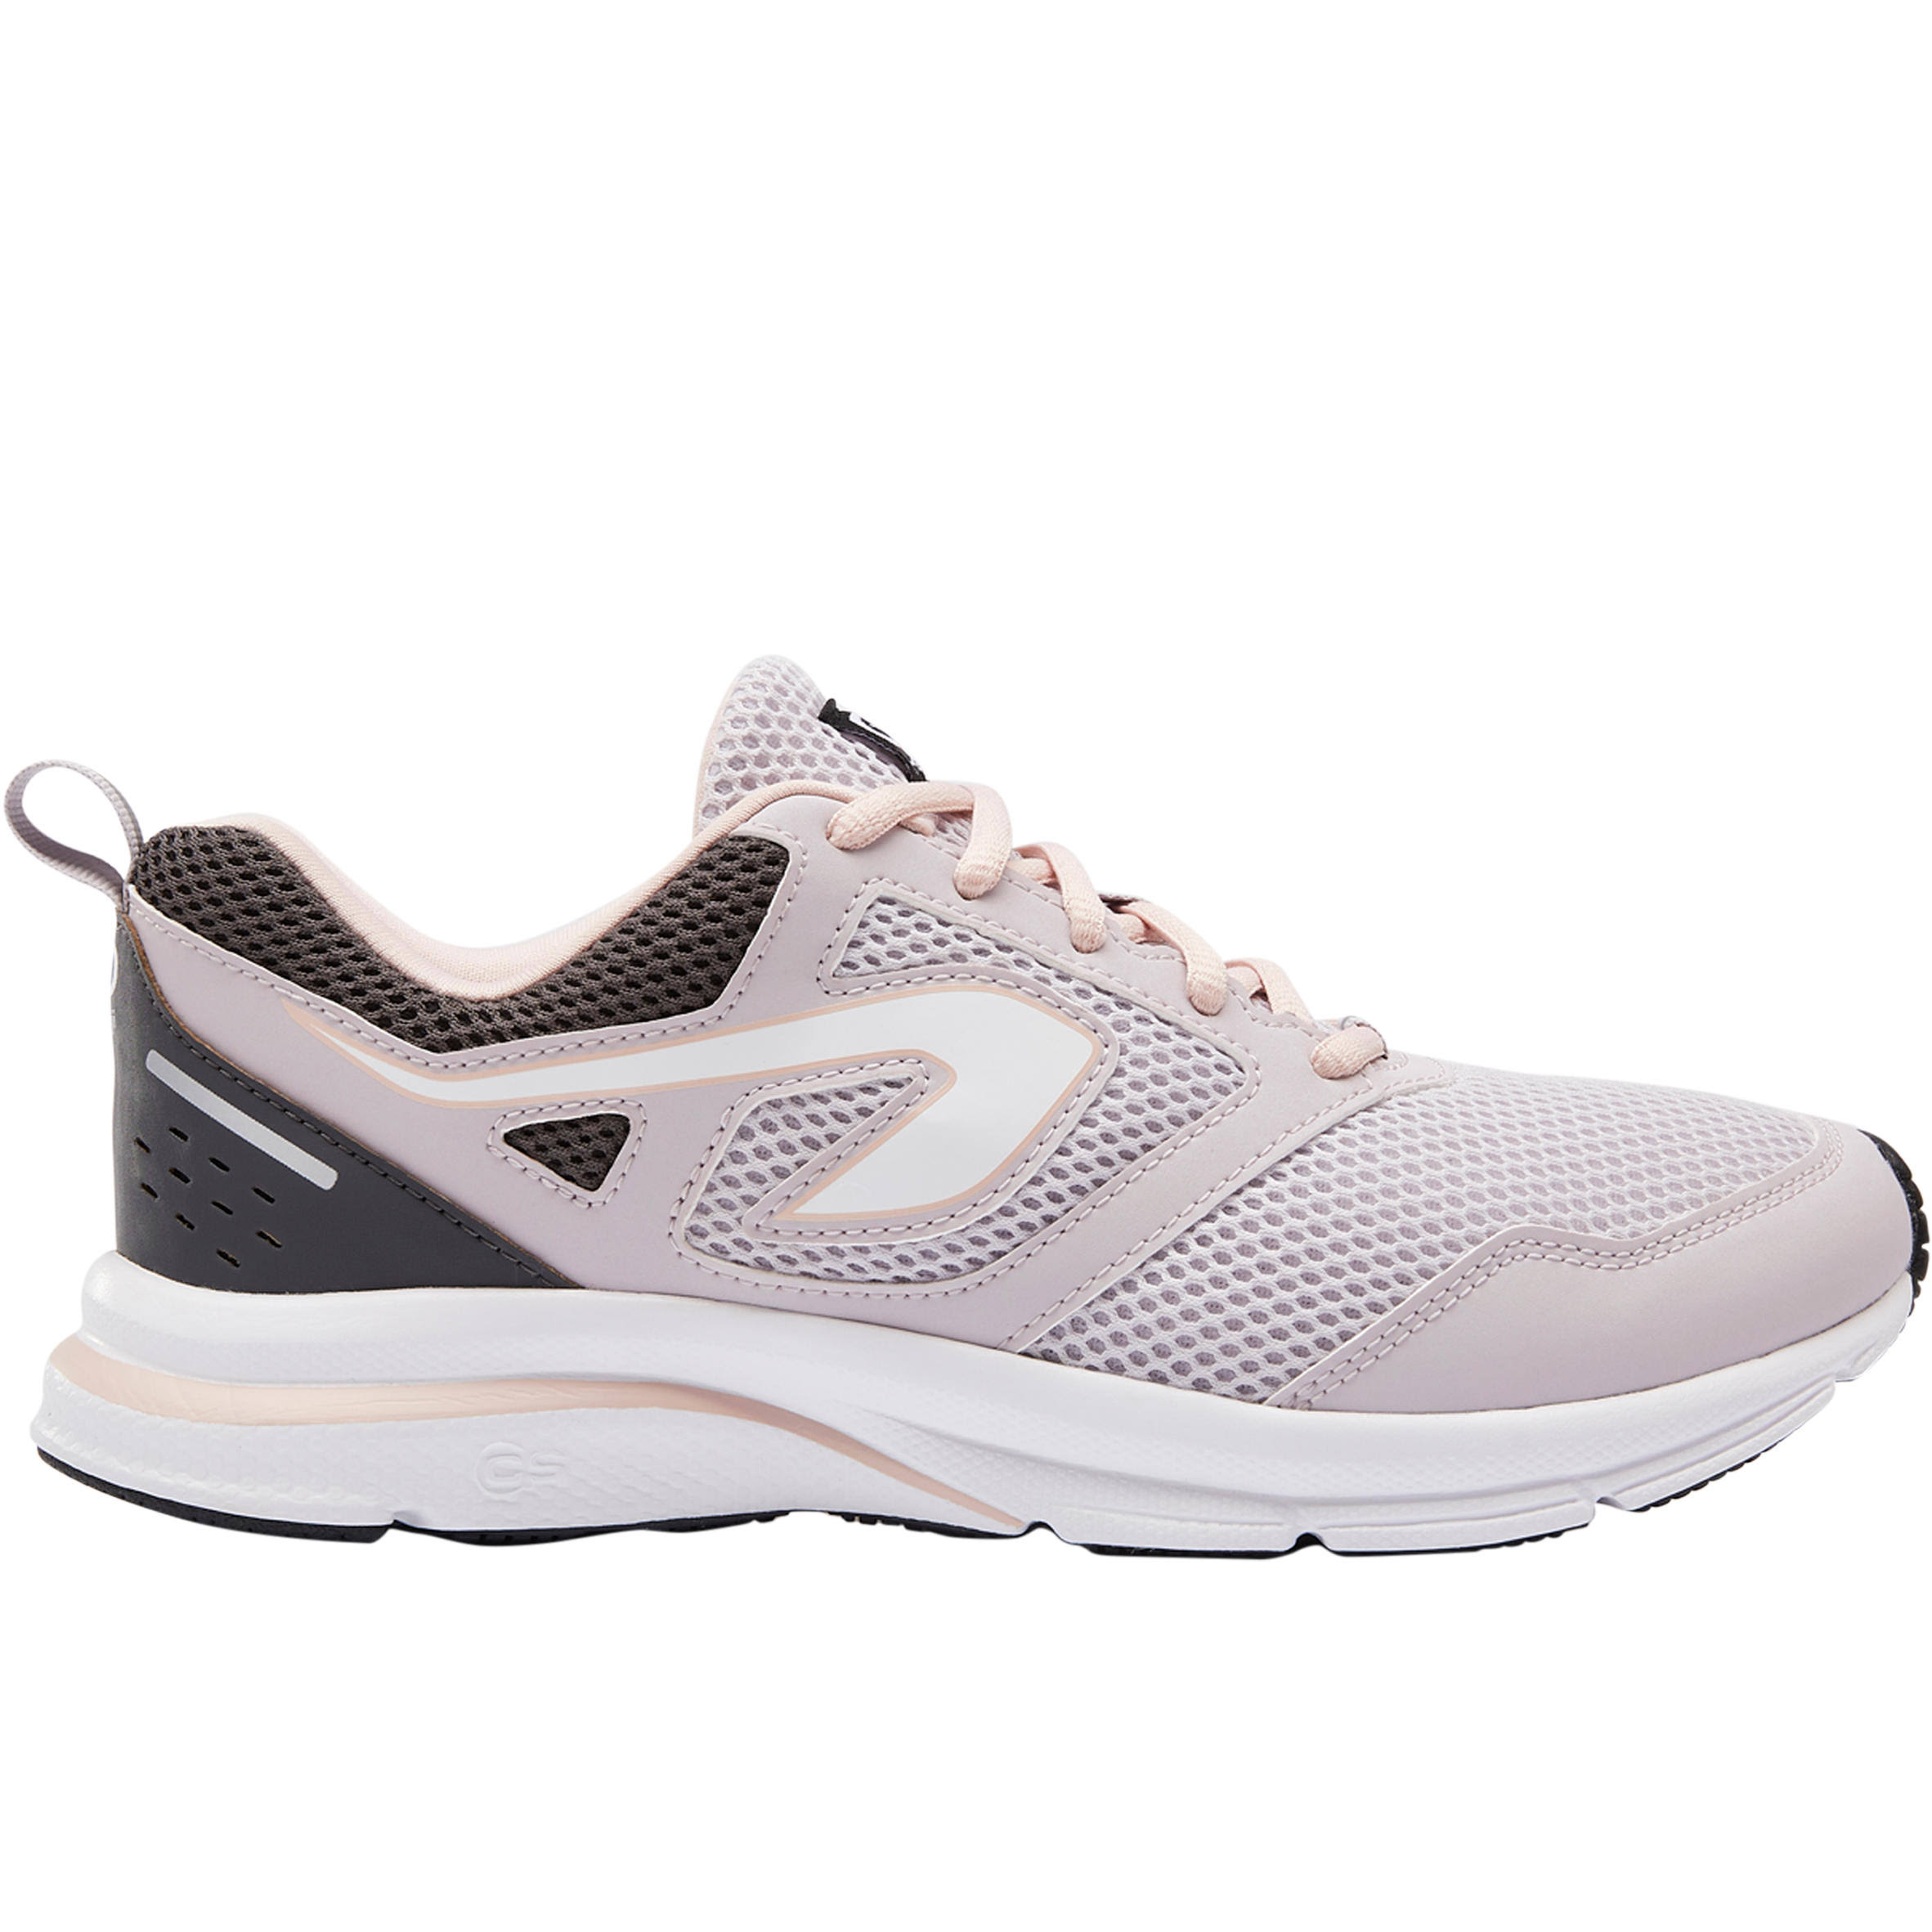 Kalenji Active Women's Jogging Shoes - Pink